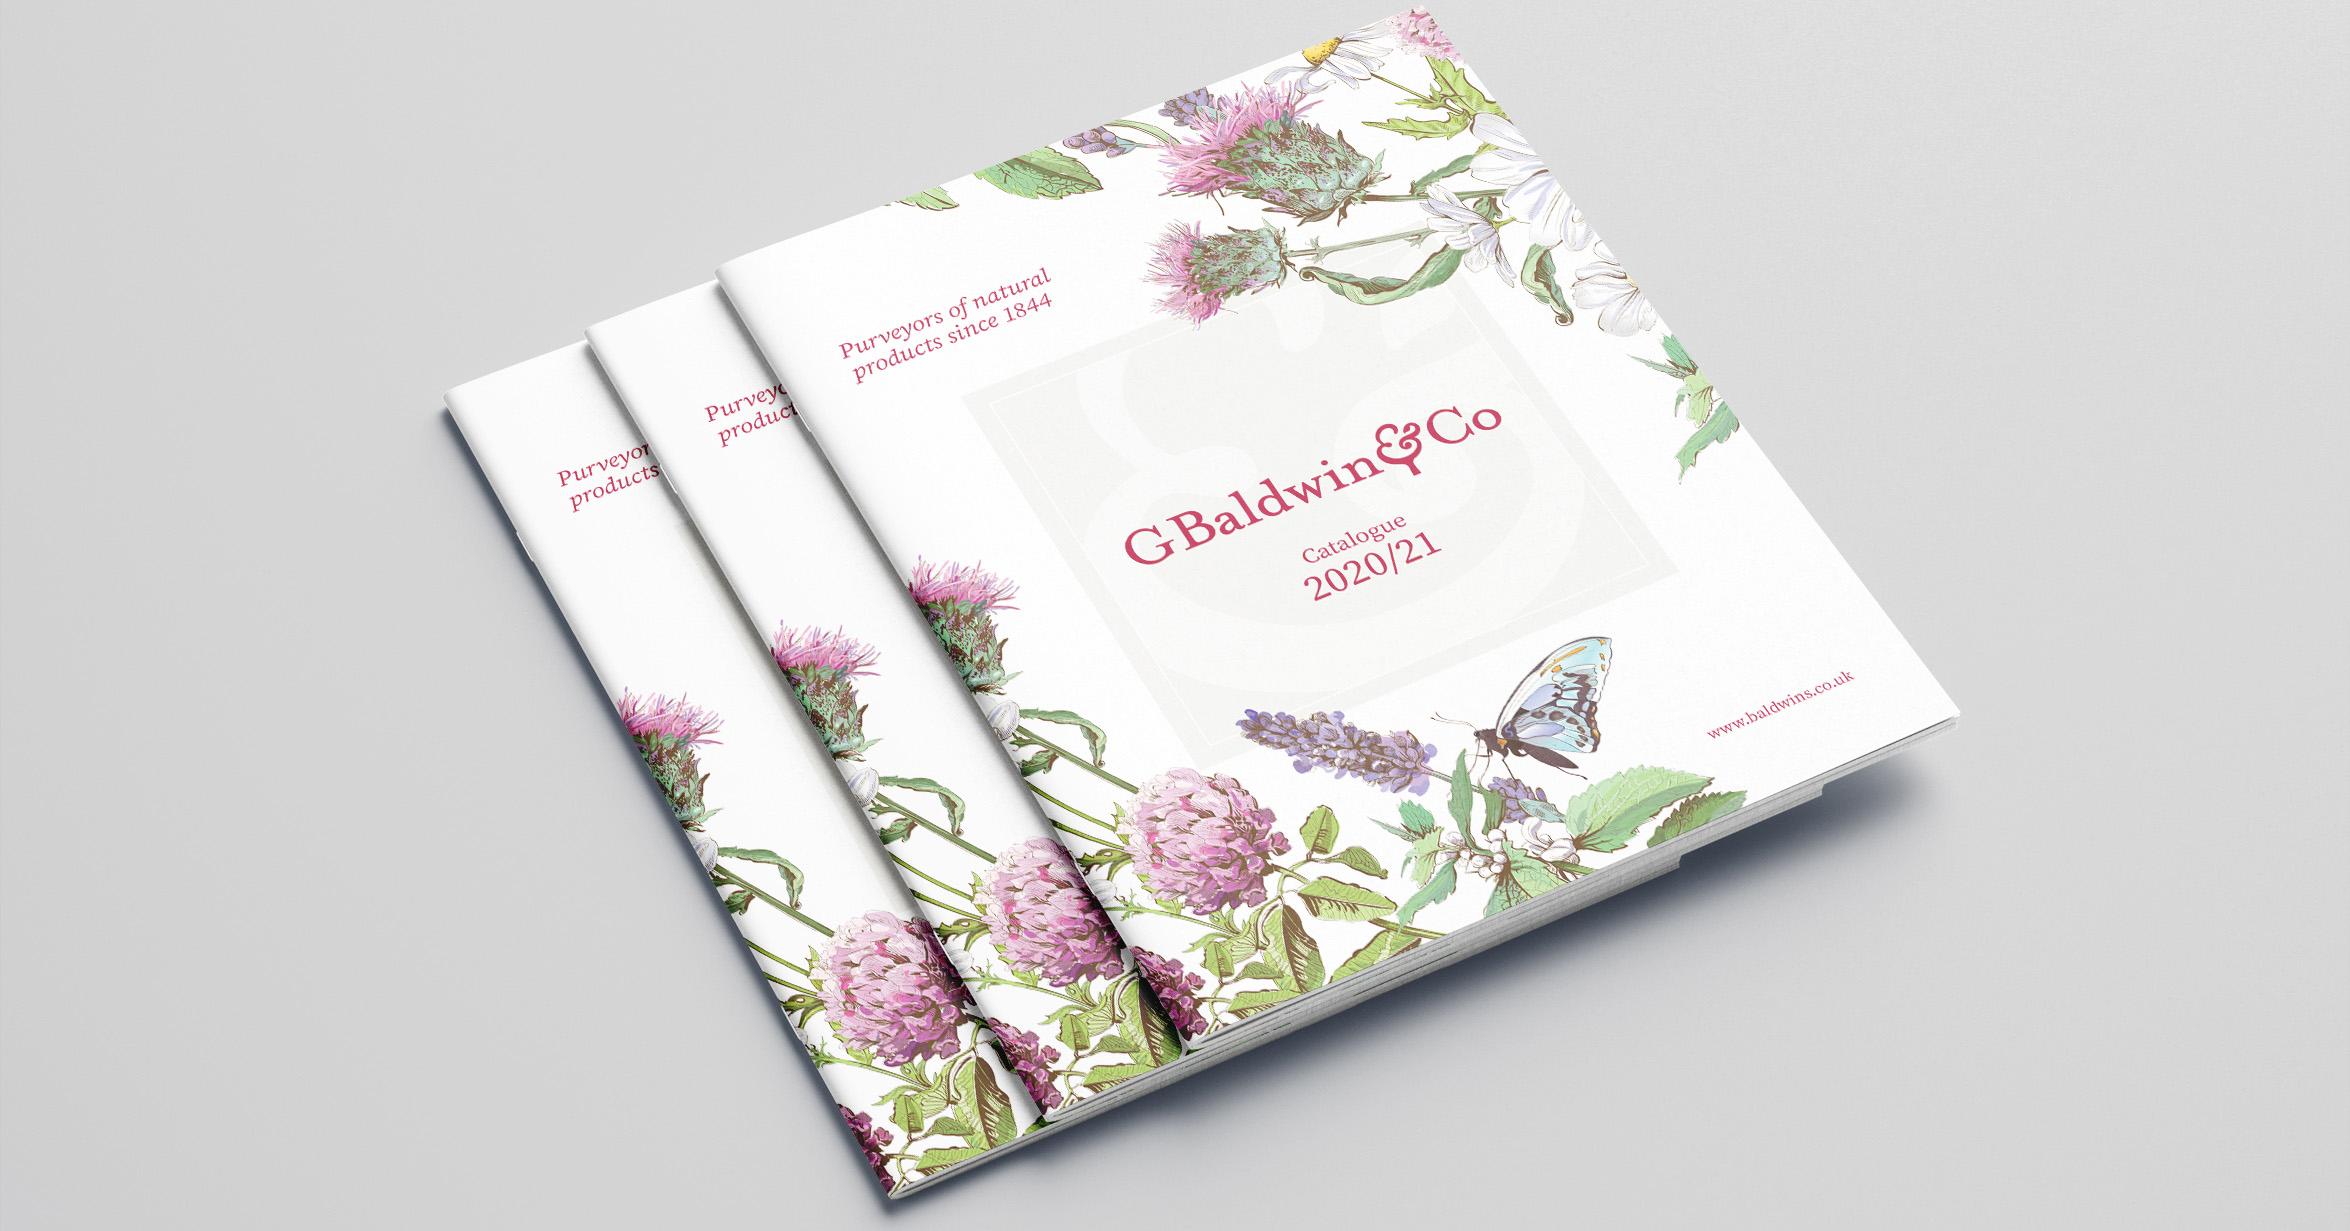 Catalogue Design and Production - G Baldwin & Co